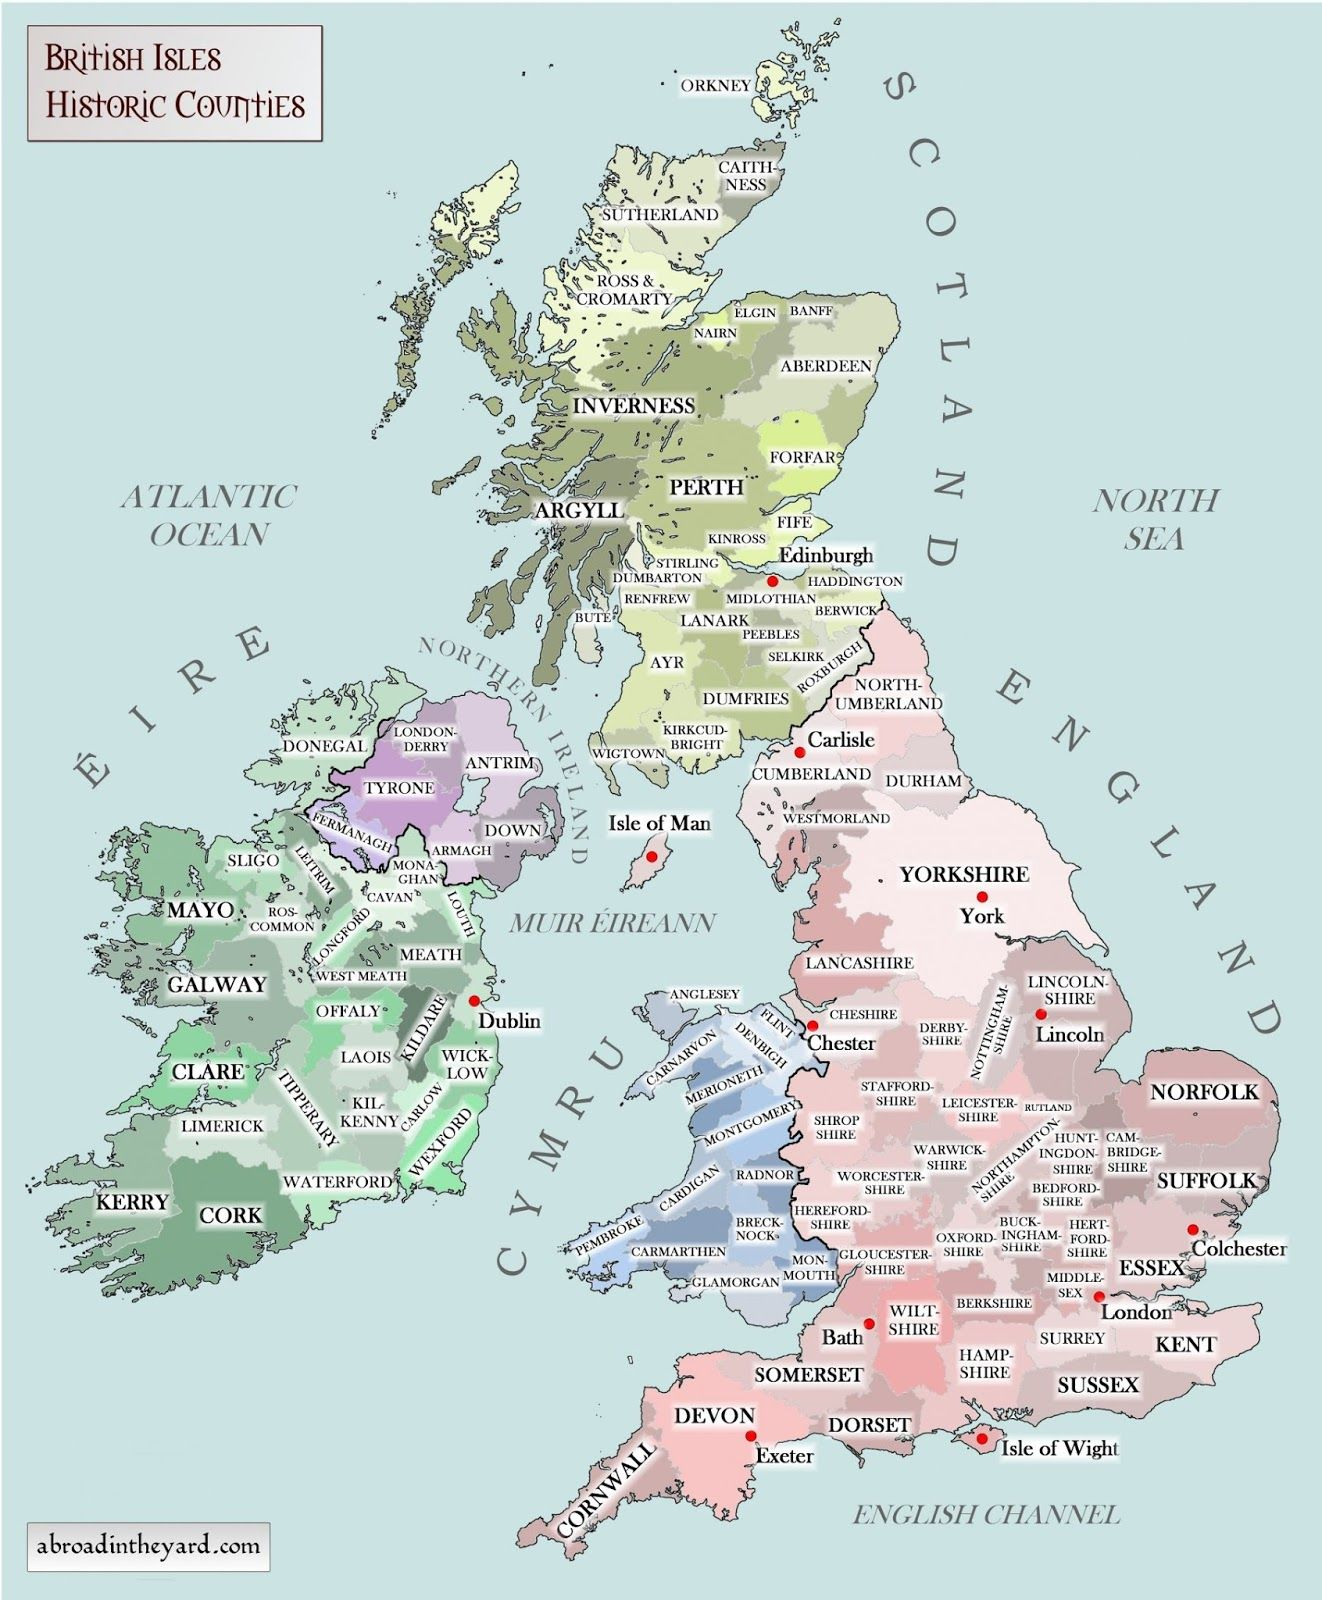 British Isles Historic Counties